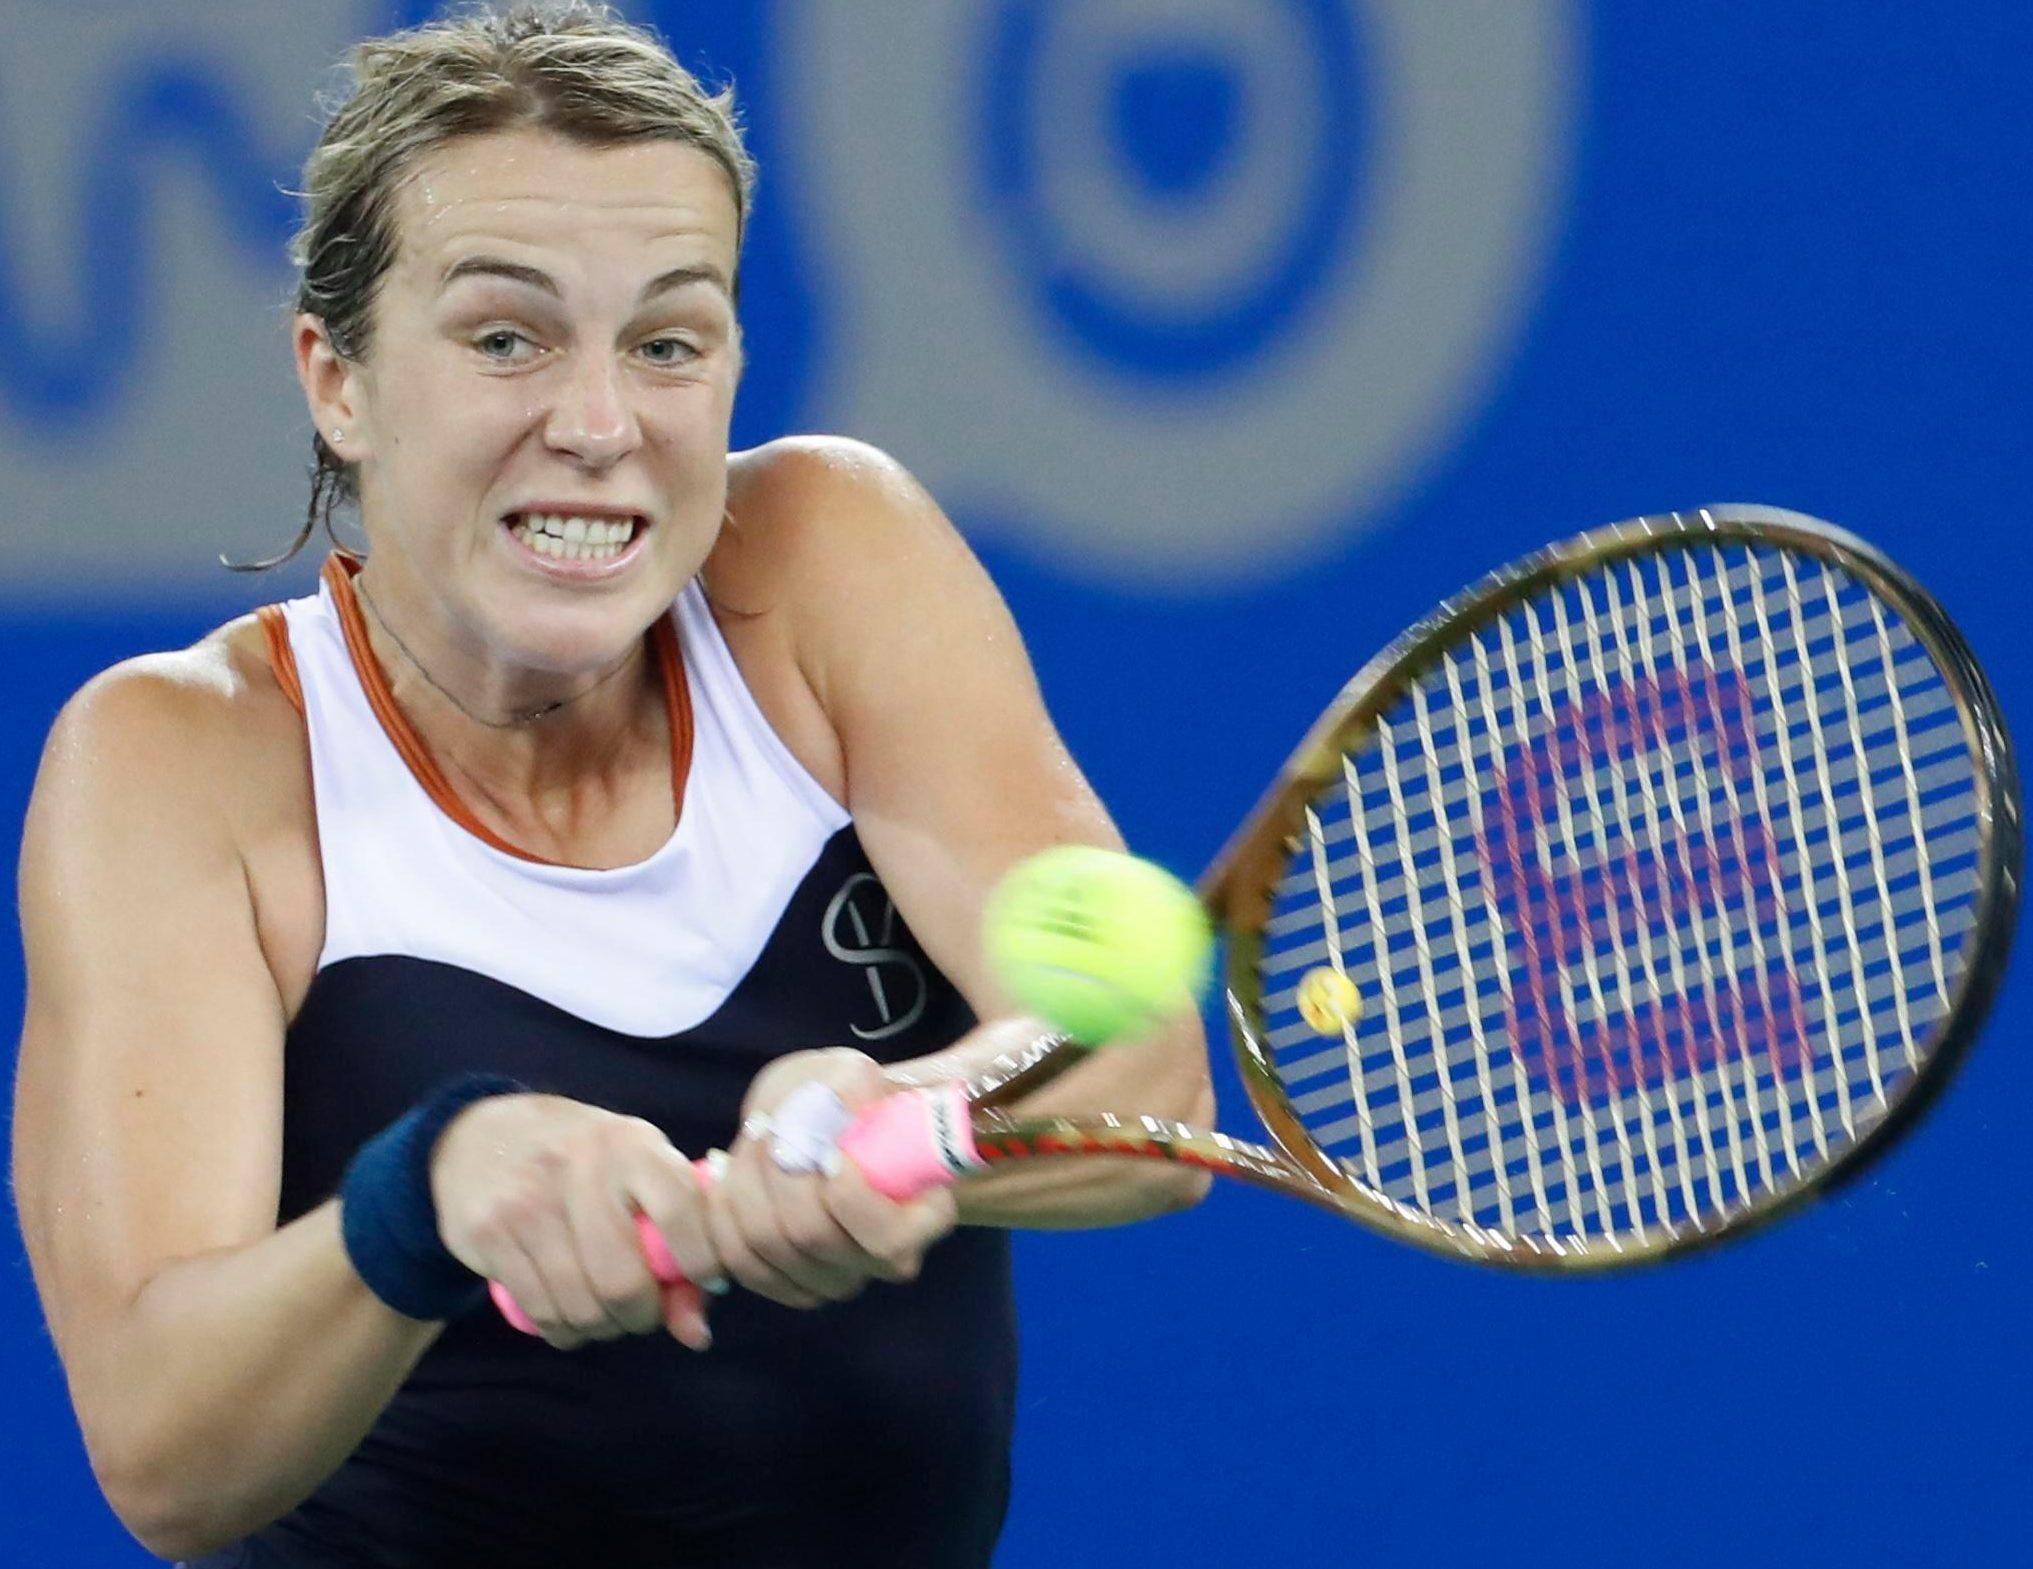 PetraKvitova is a double Wimbledon champion and a mega winner on the women's circuit